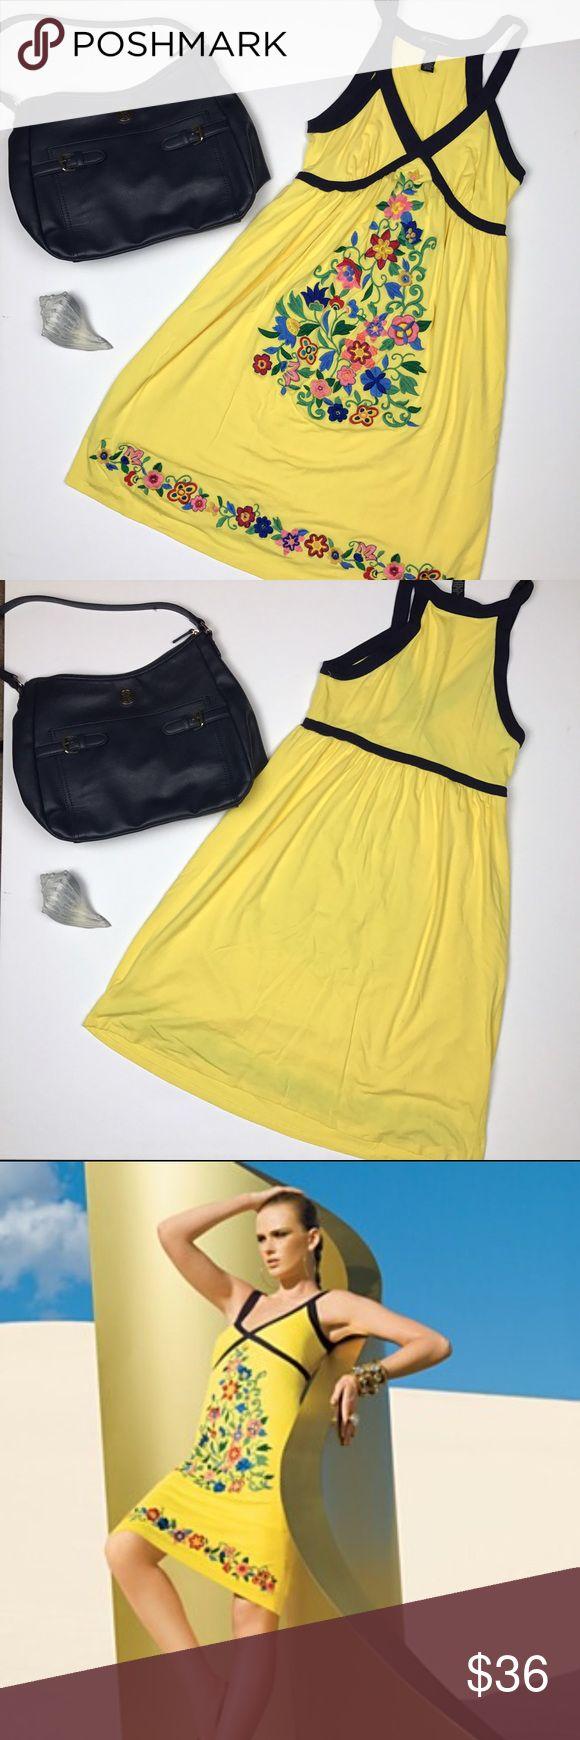 INC petite yellow embroidered floral dress sz S INC petite yellow with navy blue trim and embroidered floral motif on the front of the dress. Lined.  Size S petite. Ptp 14.5, length 38 INC International Concepts Dresses